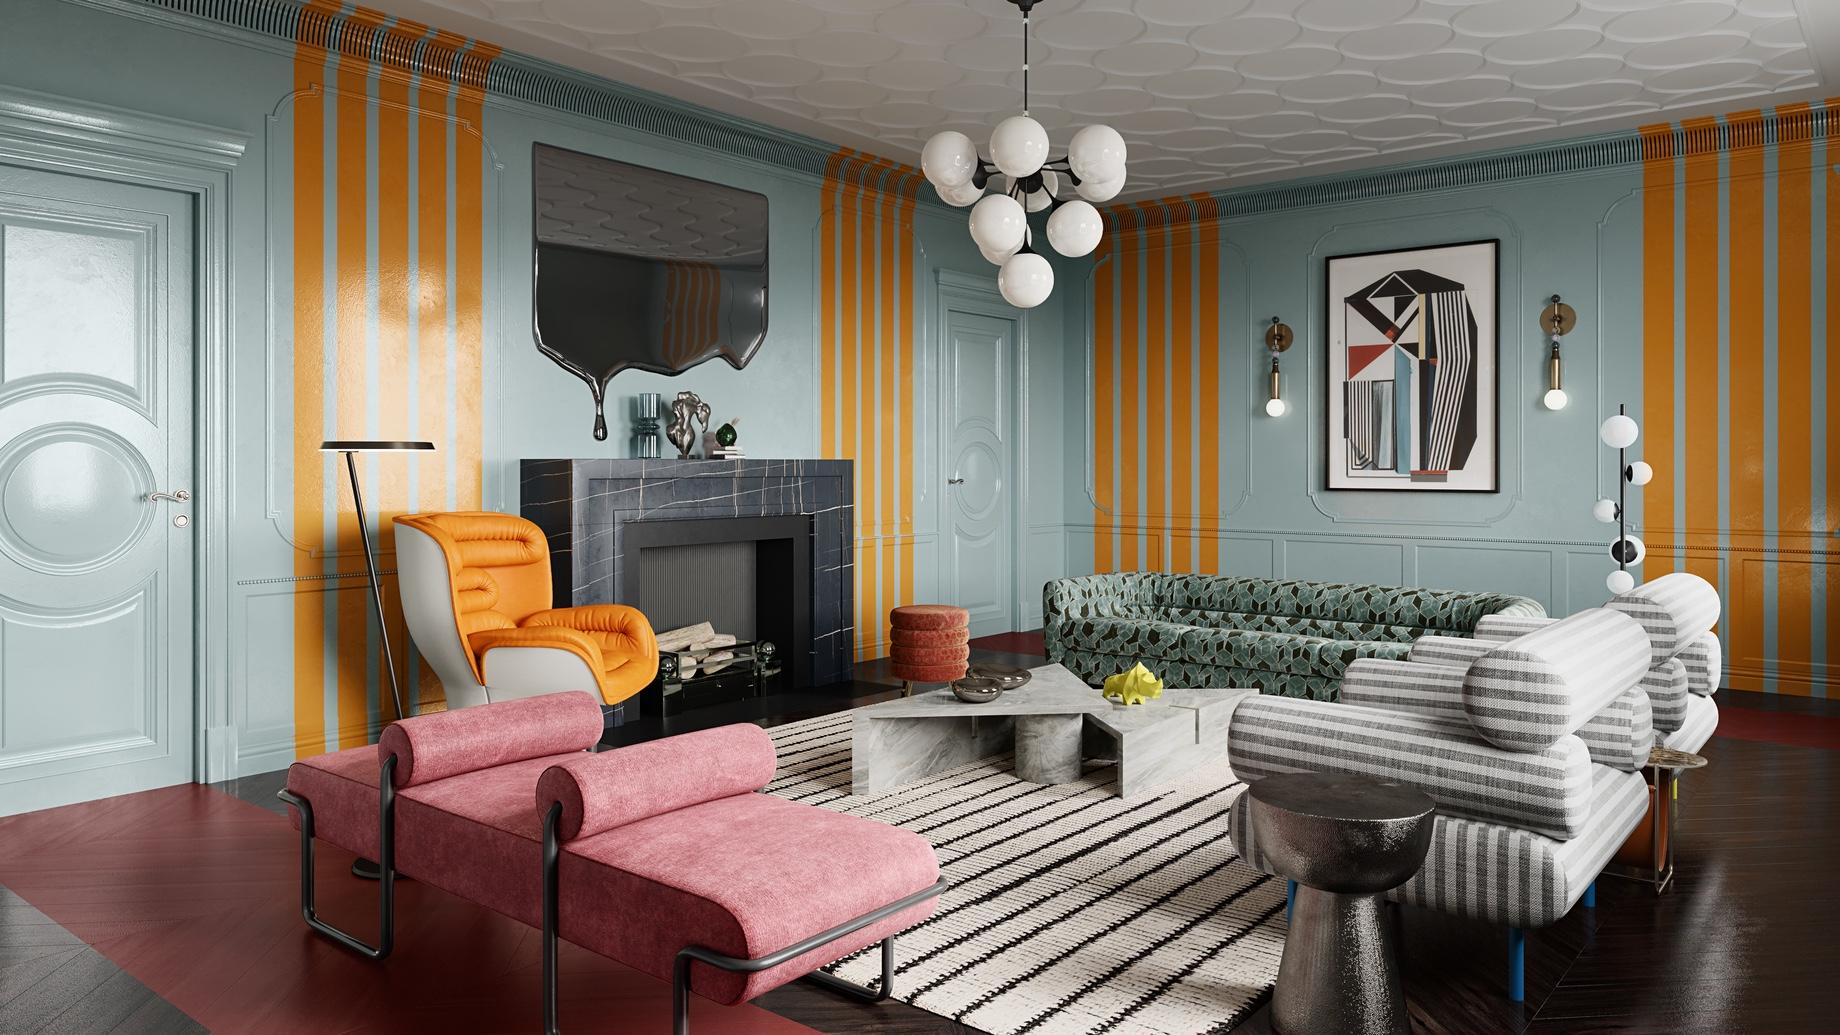 Statement Decor Pieces – Top 6 Interior Design Trends for Luxury Living in California